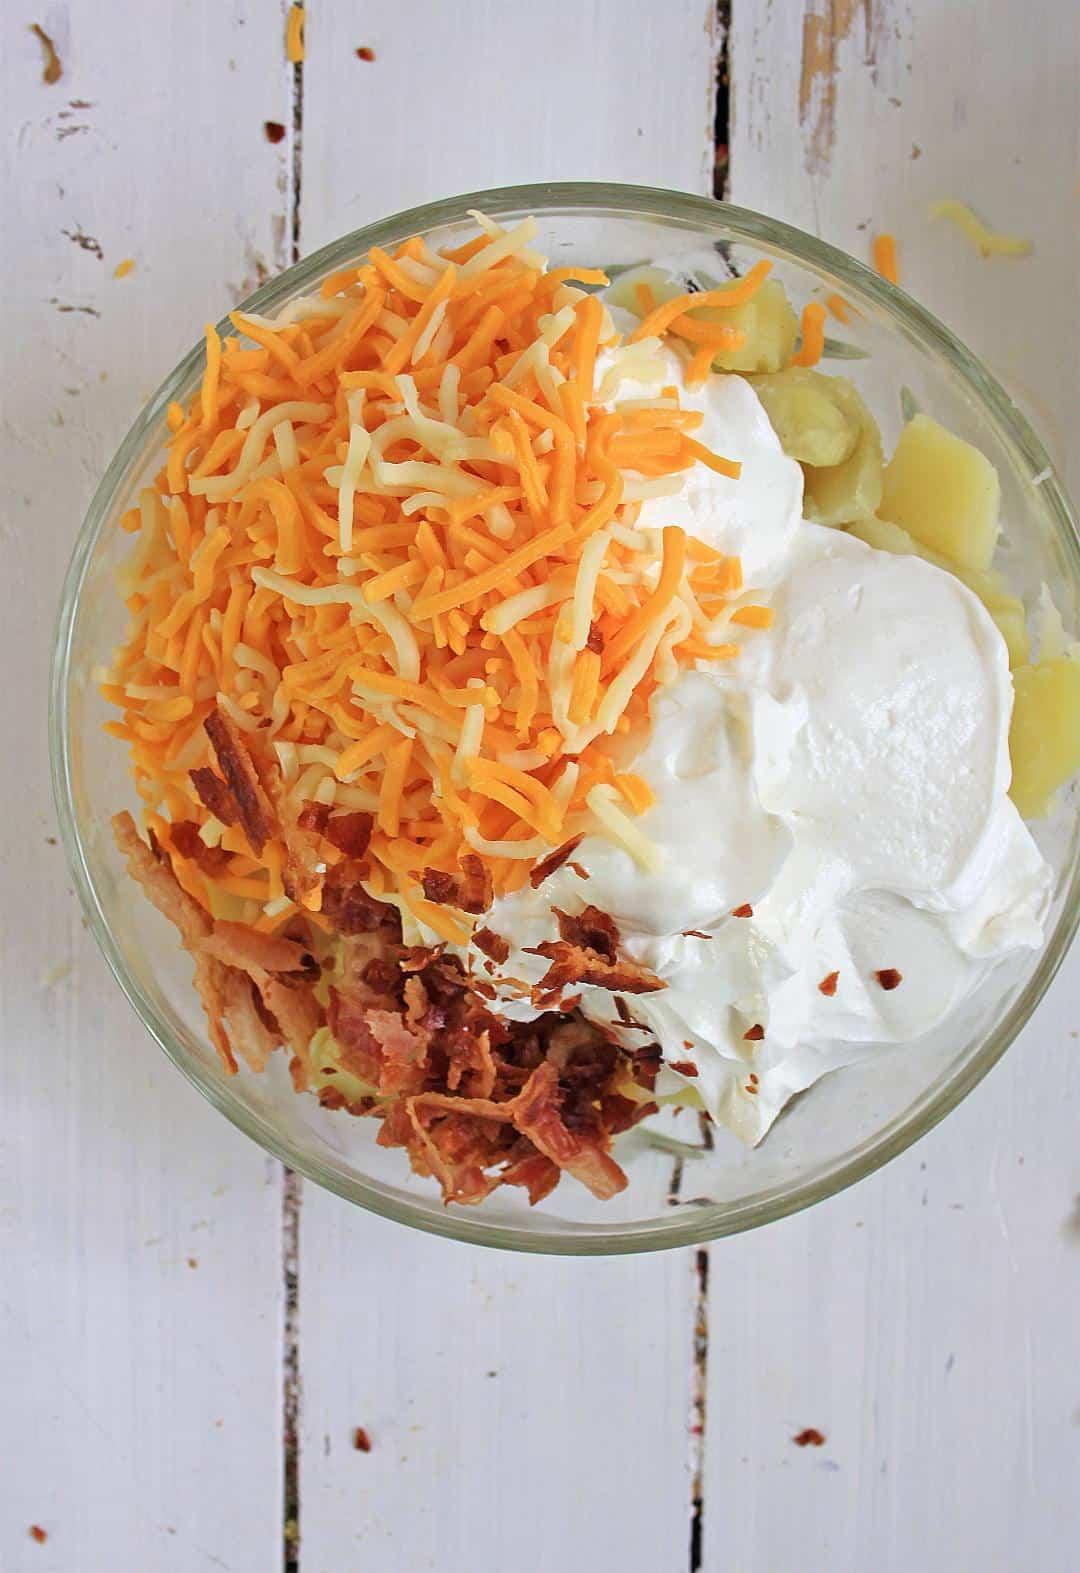 How to make a Loaded Baked Potato Salad.